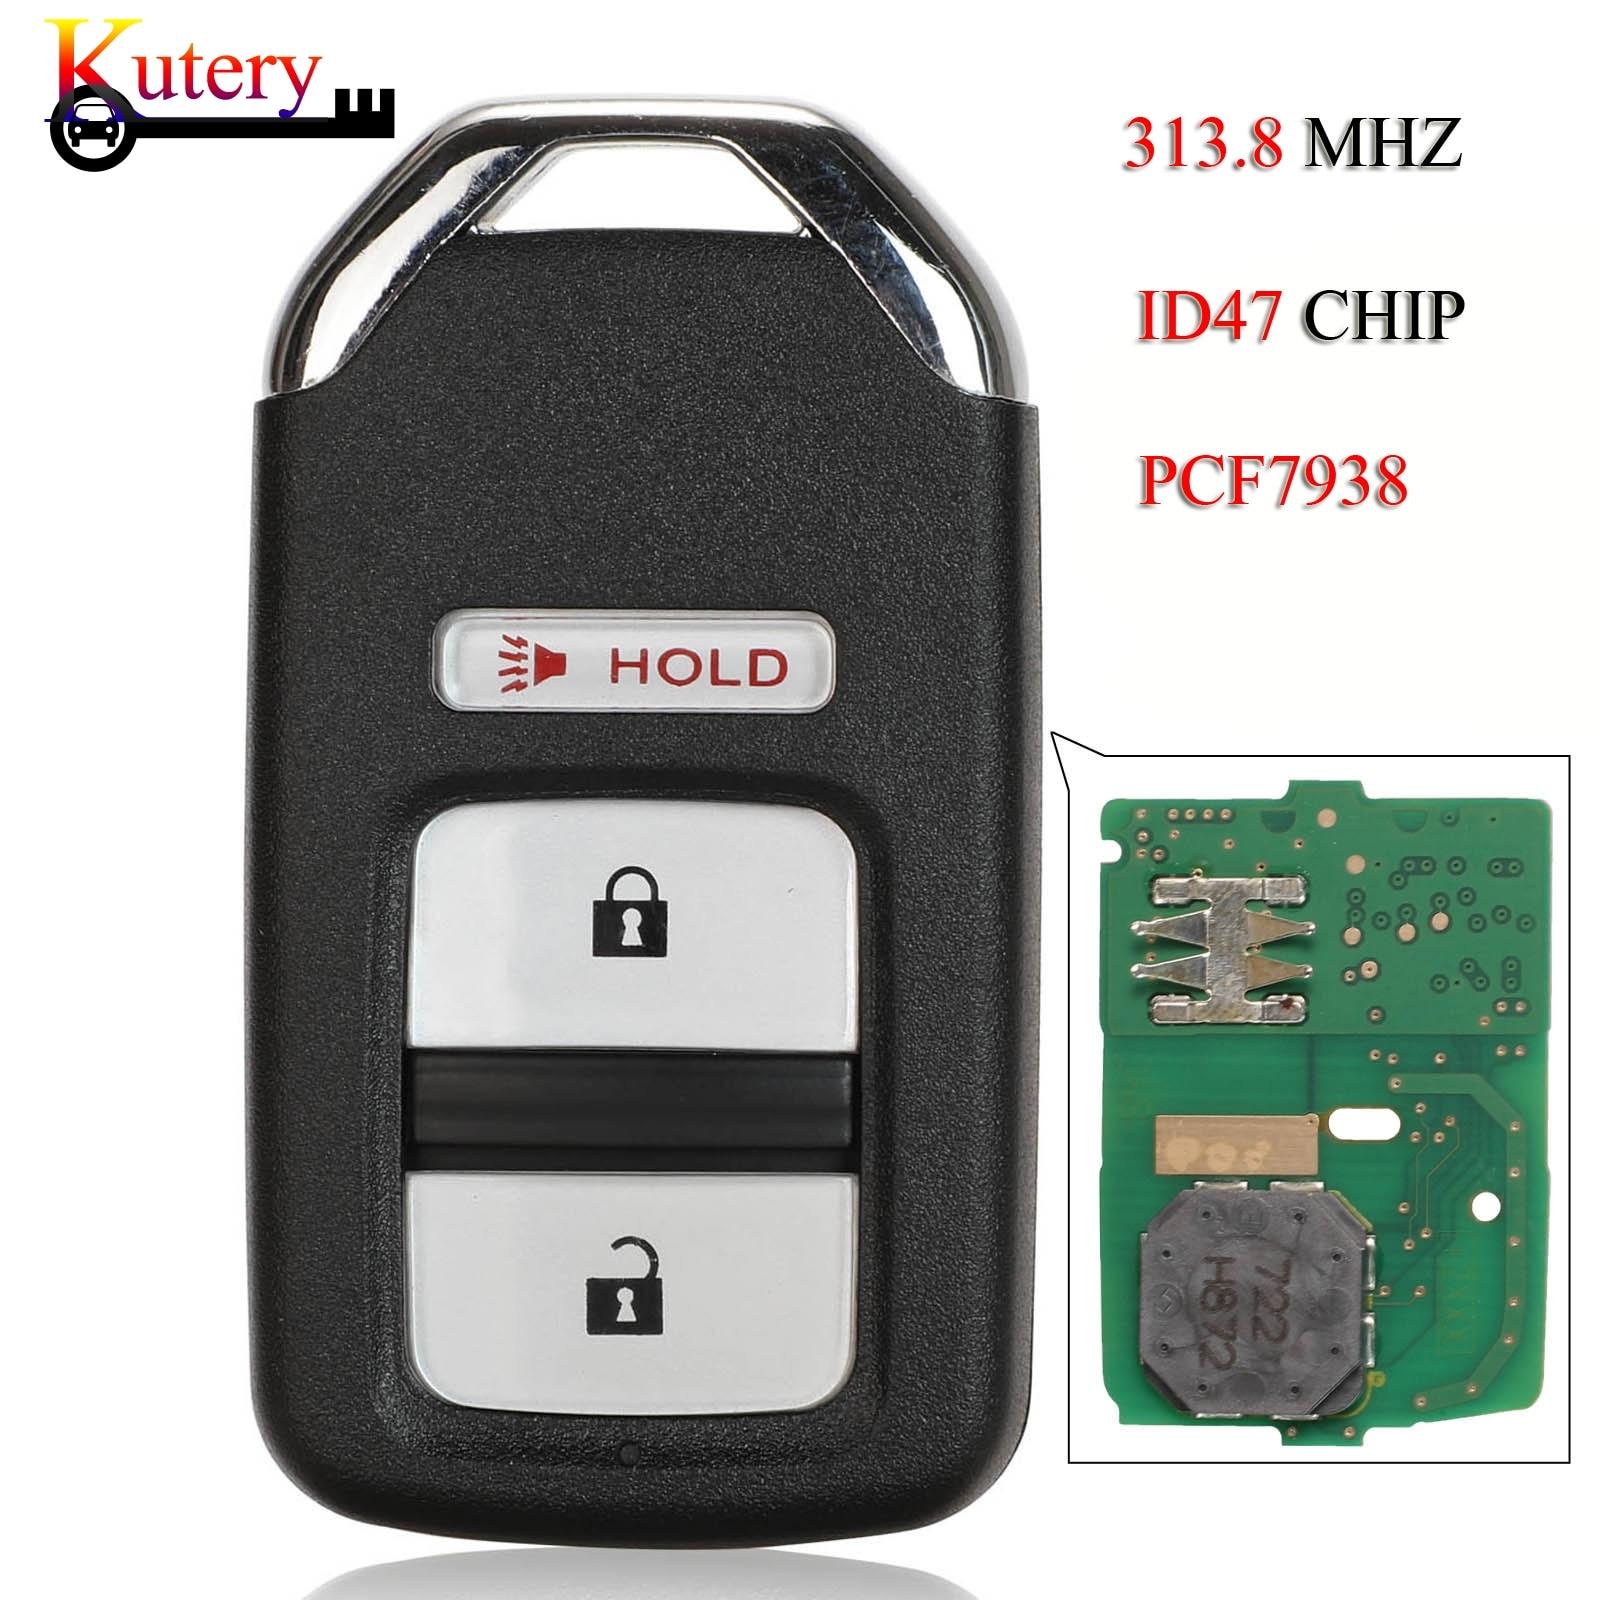 Умный Автомобильный ключ Kutery для Honda Fit Jazz HR-V Crosstour 2 + 1 3 кнопки 313,8 МГц ID47 PCF7938 чип 72147-T5A-A01 KR5V1X